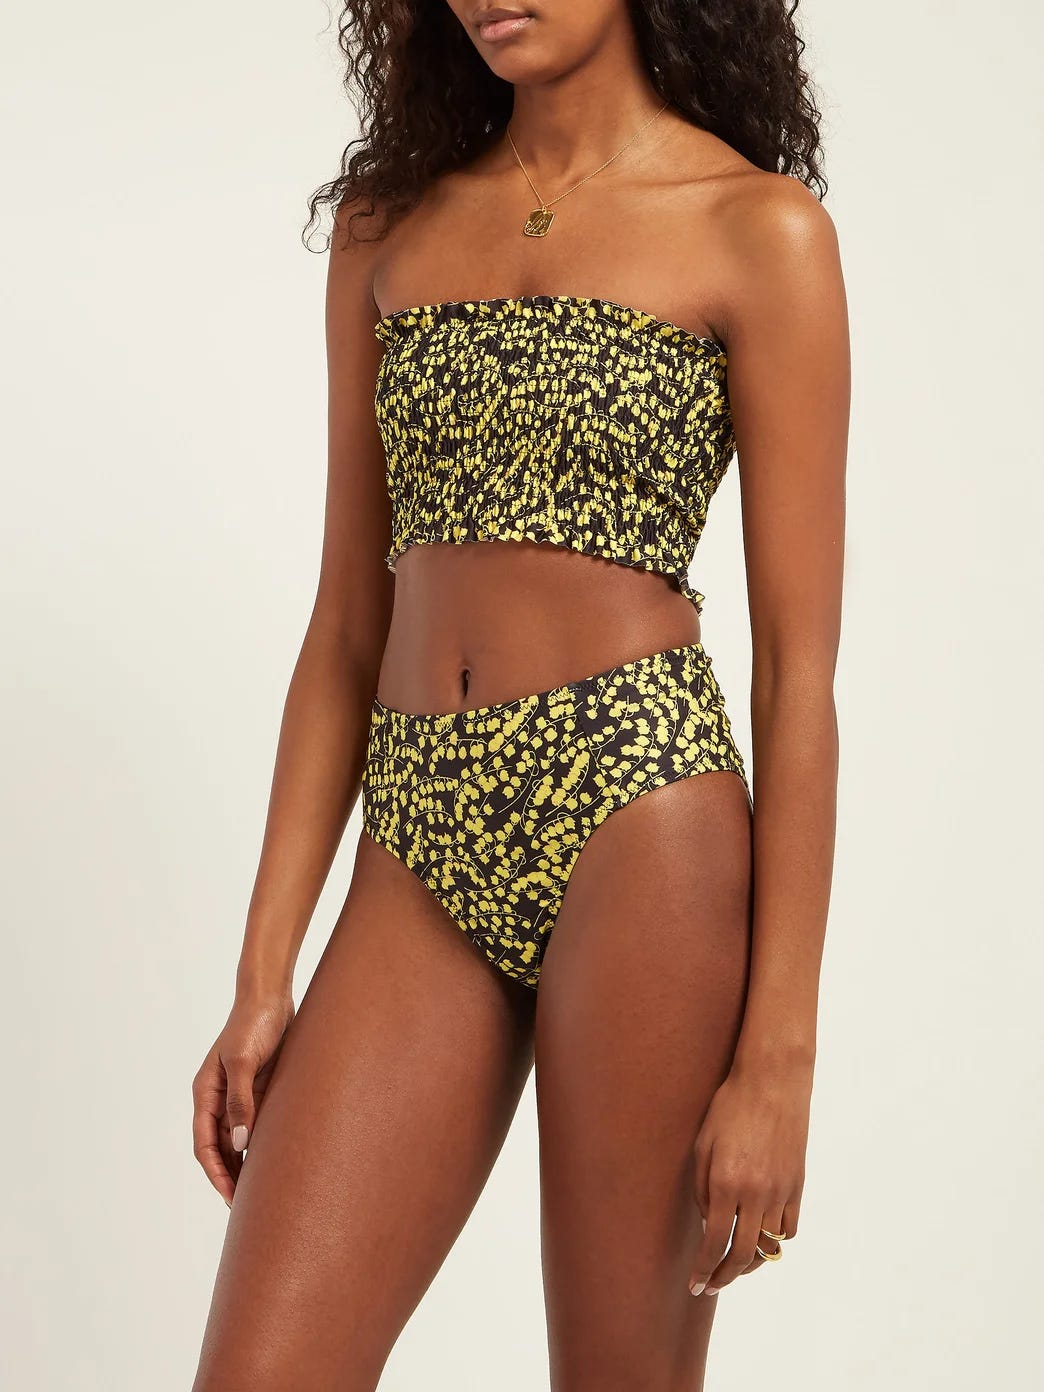 550641149d0 New Swimsuit Trends 2019 Cool Bikini, One-Piece Styles